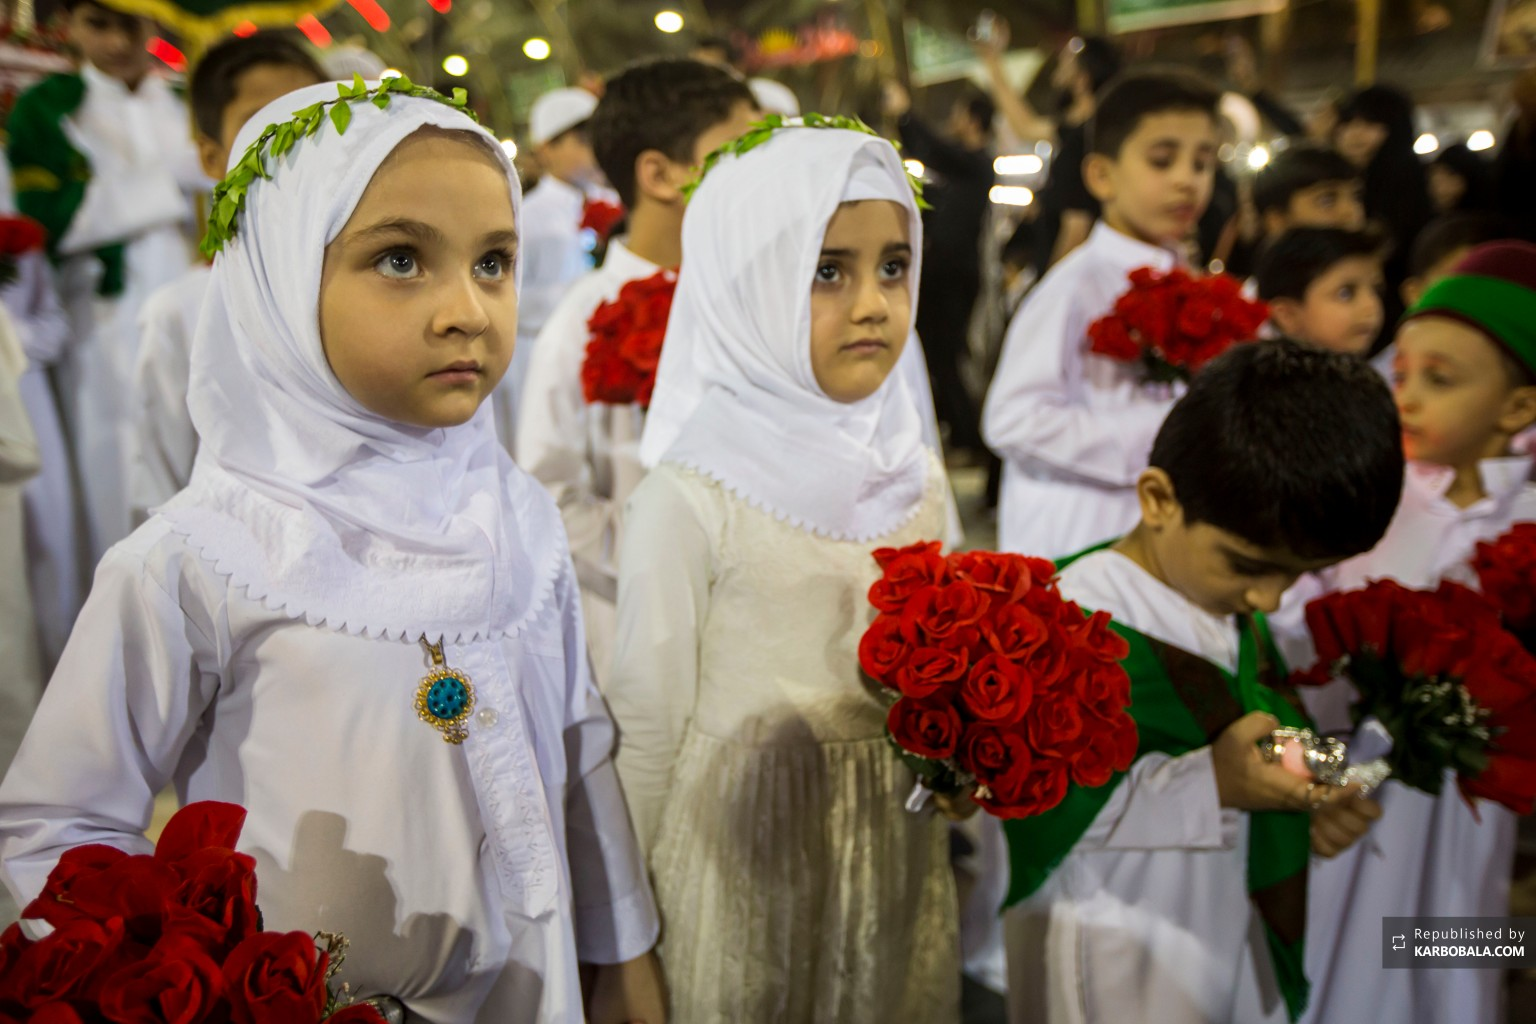 کودکان پاک حسینی در شب شام غریبان آن حضرت